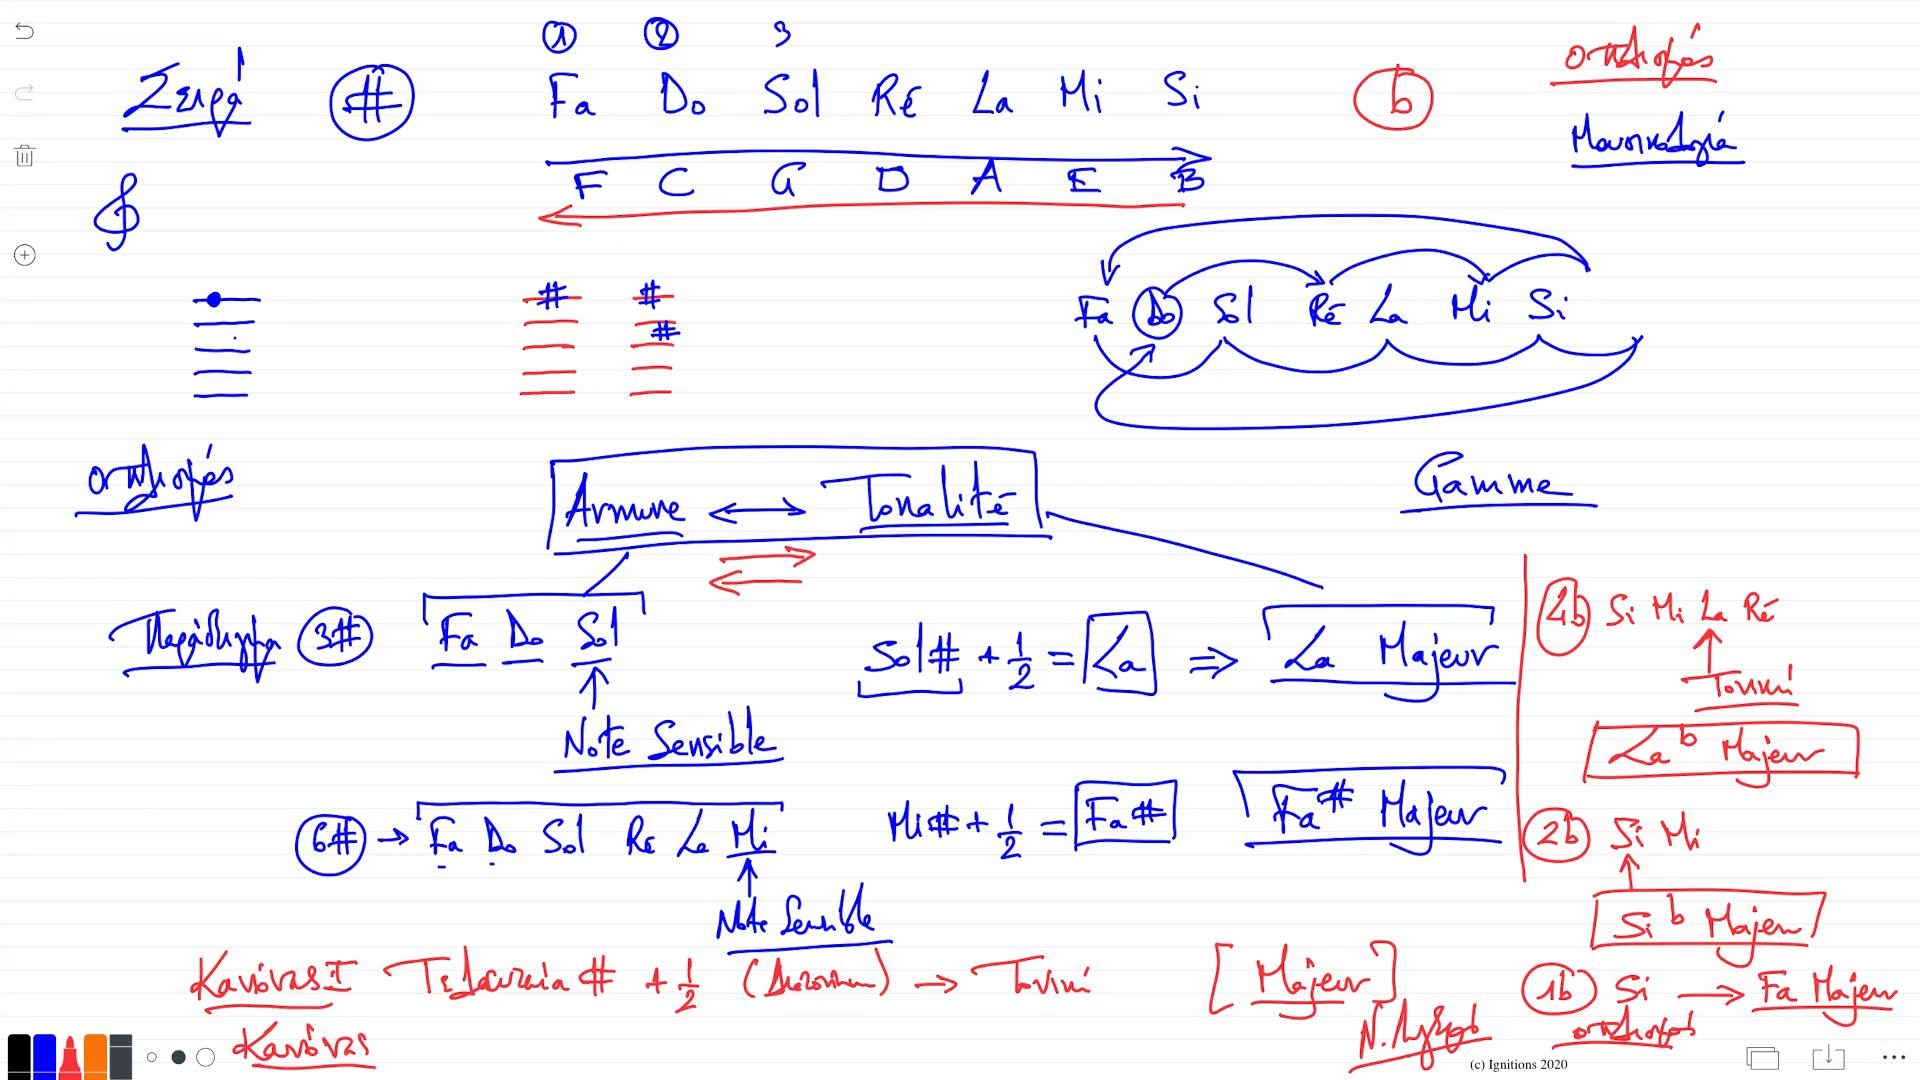 56228 - e-Μάθημα: Εισαγωγή στη μουσικολογία. (Dessin)